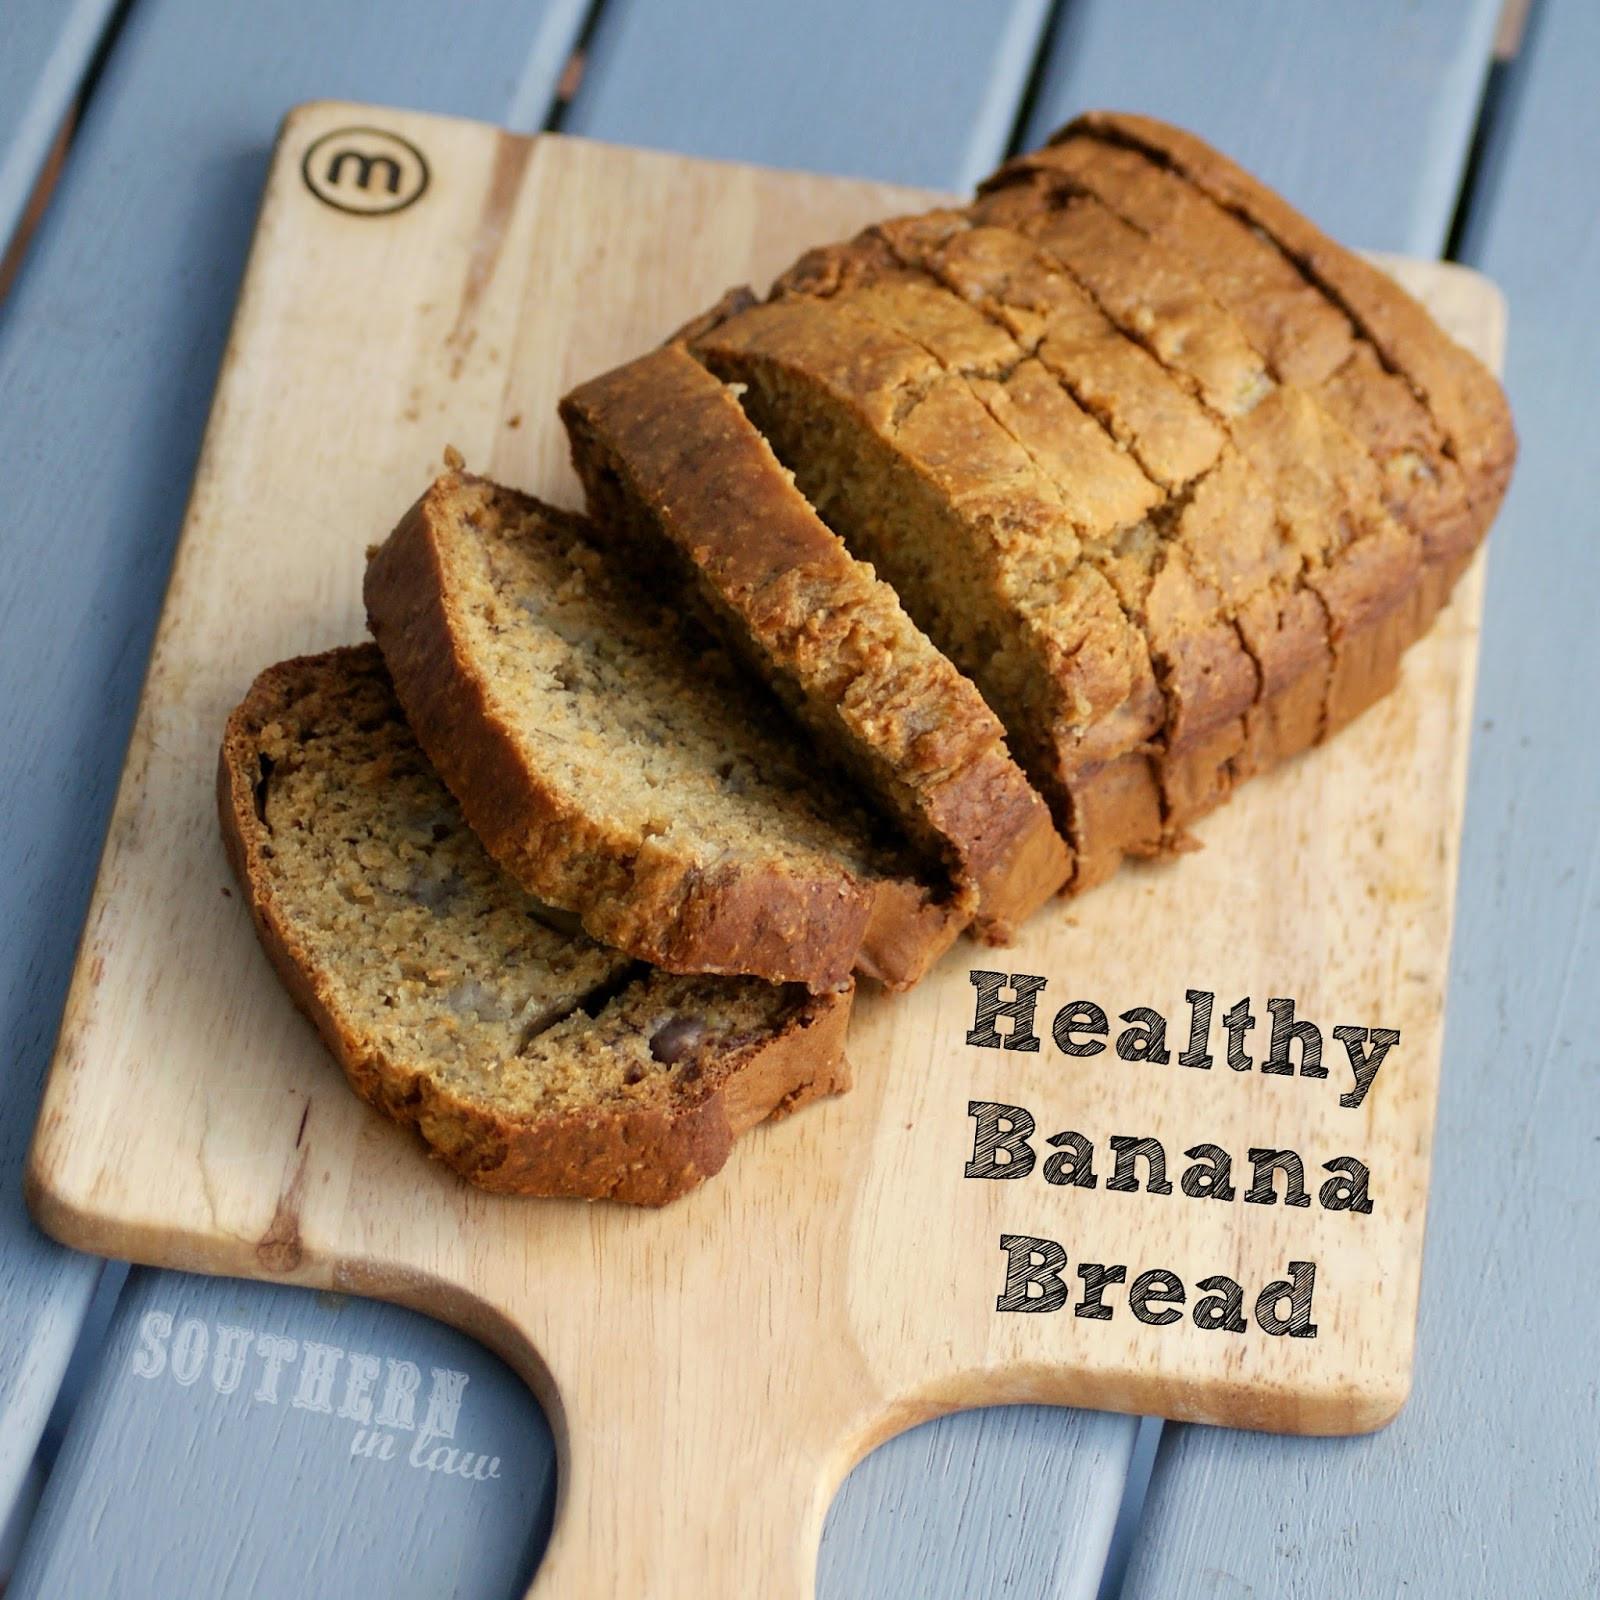 Healthy Banana Bread  Southern In Law Recipe Healthy Banana Bread